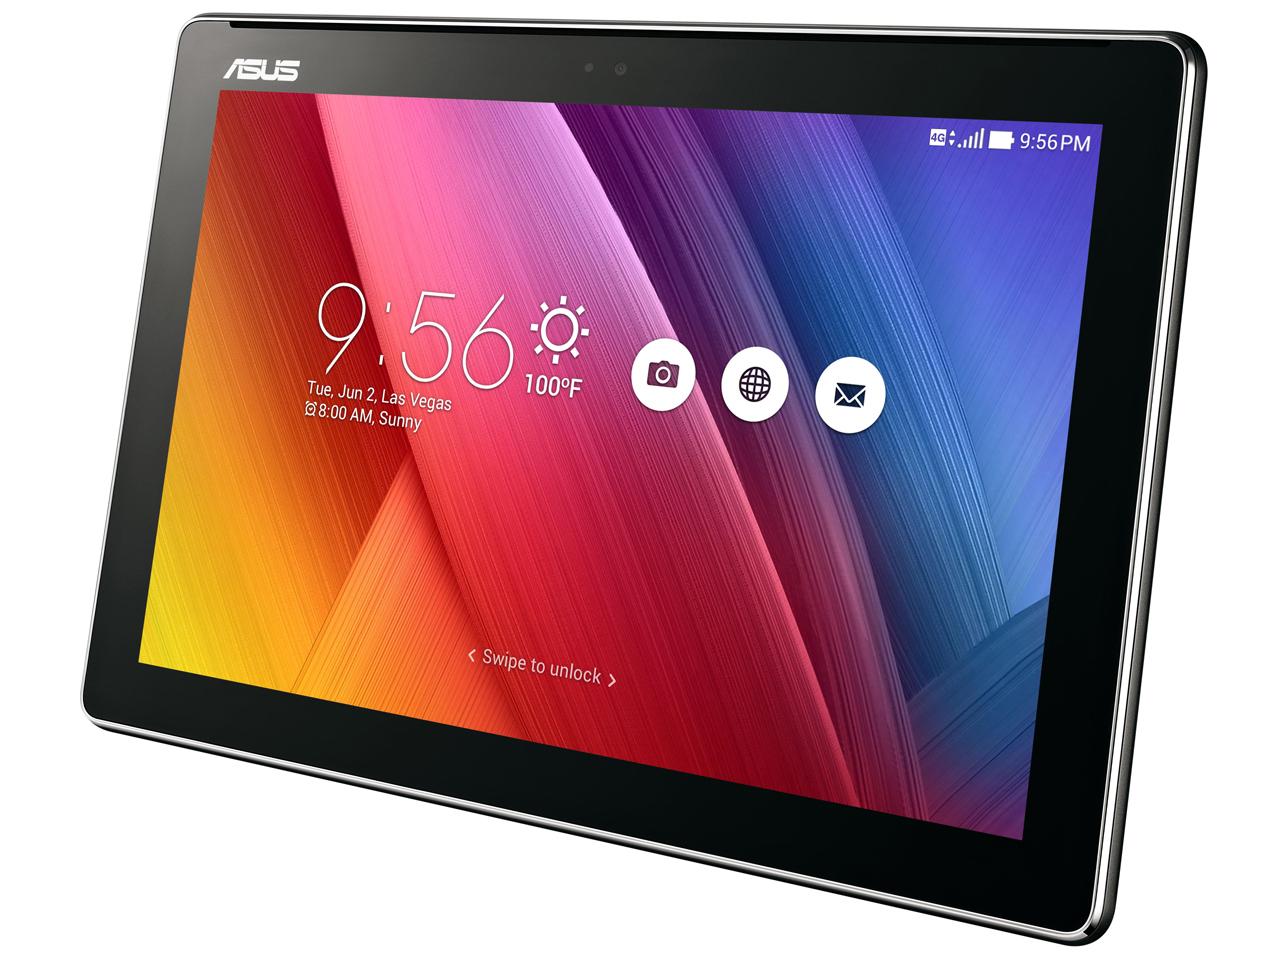 ASUSから「ZenPad 10 Z300CNL」が登場!スペックや価格・発売日情報